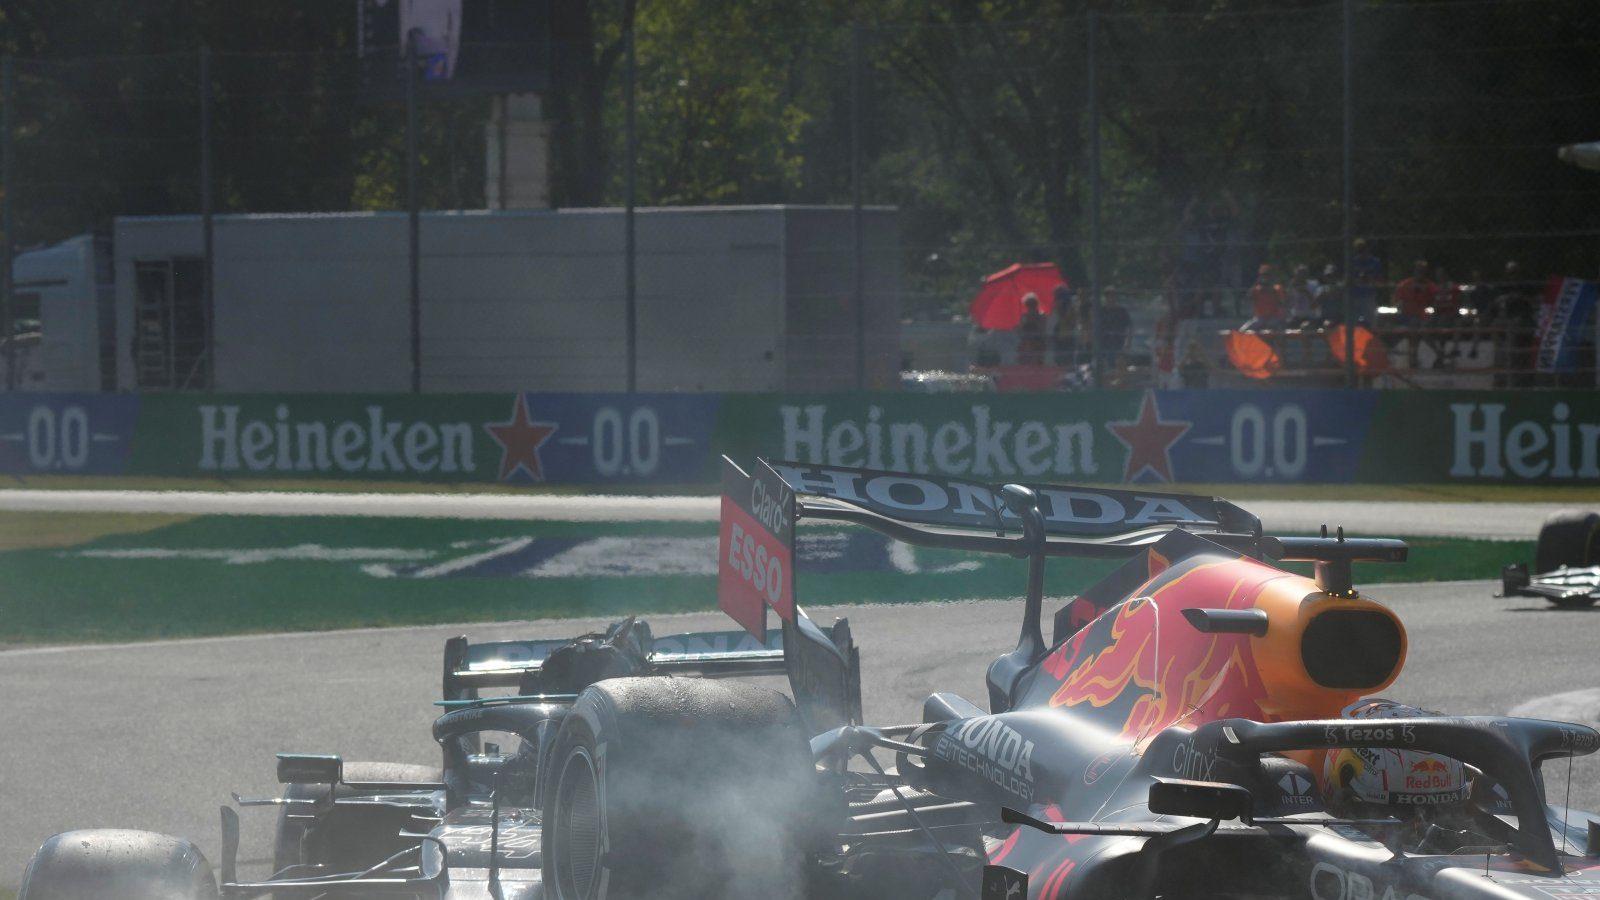 F1: Mercedes Calls for Change After Crash Between Title Rivals Lewis Hamilton and Max Verstappen